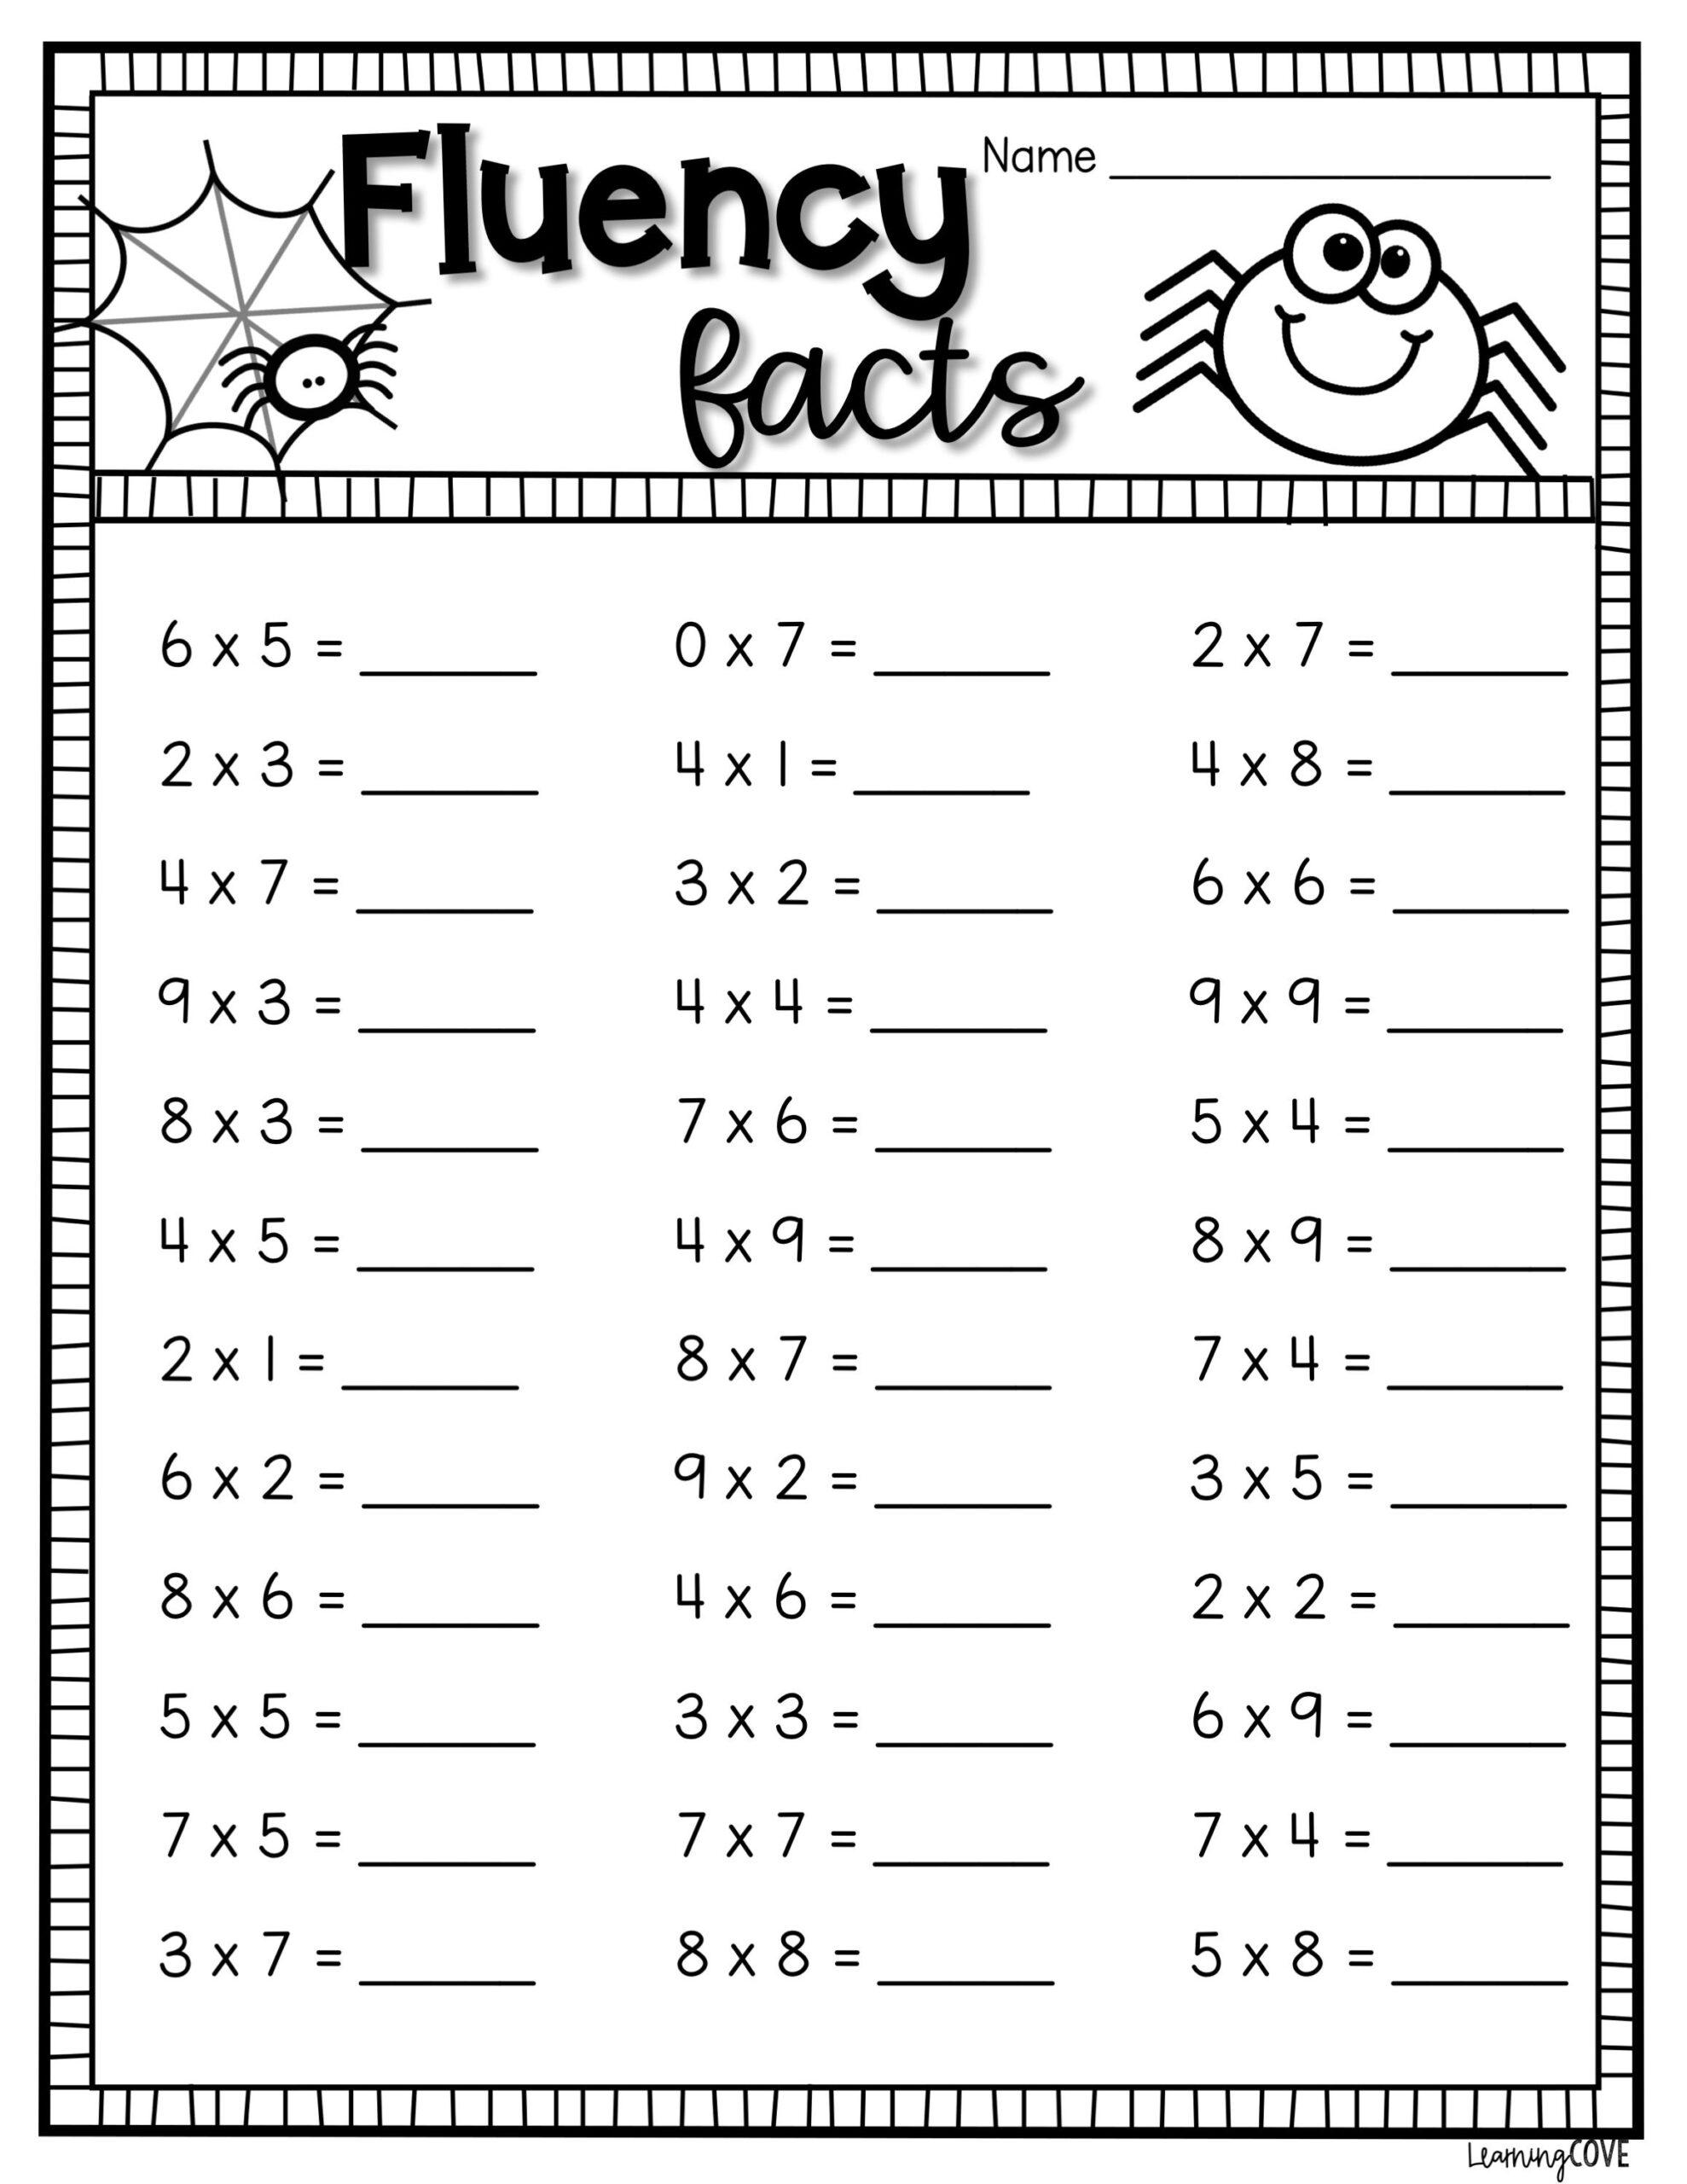 Halloween Math Multiplication Worksheets In 2020 | Math